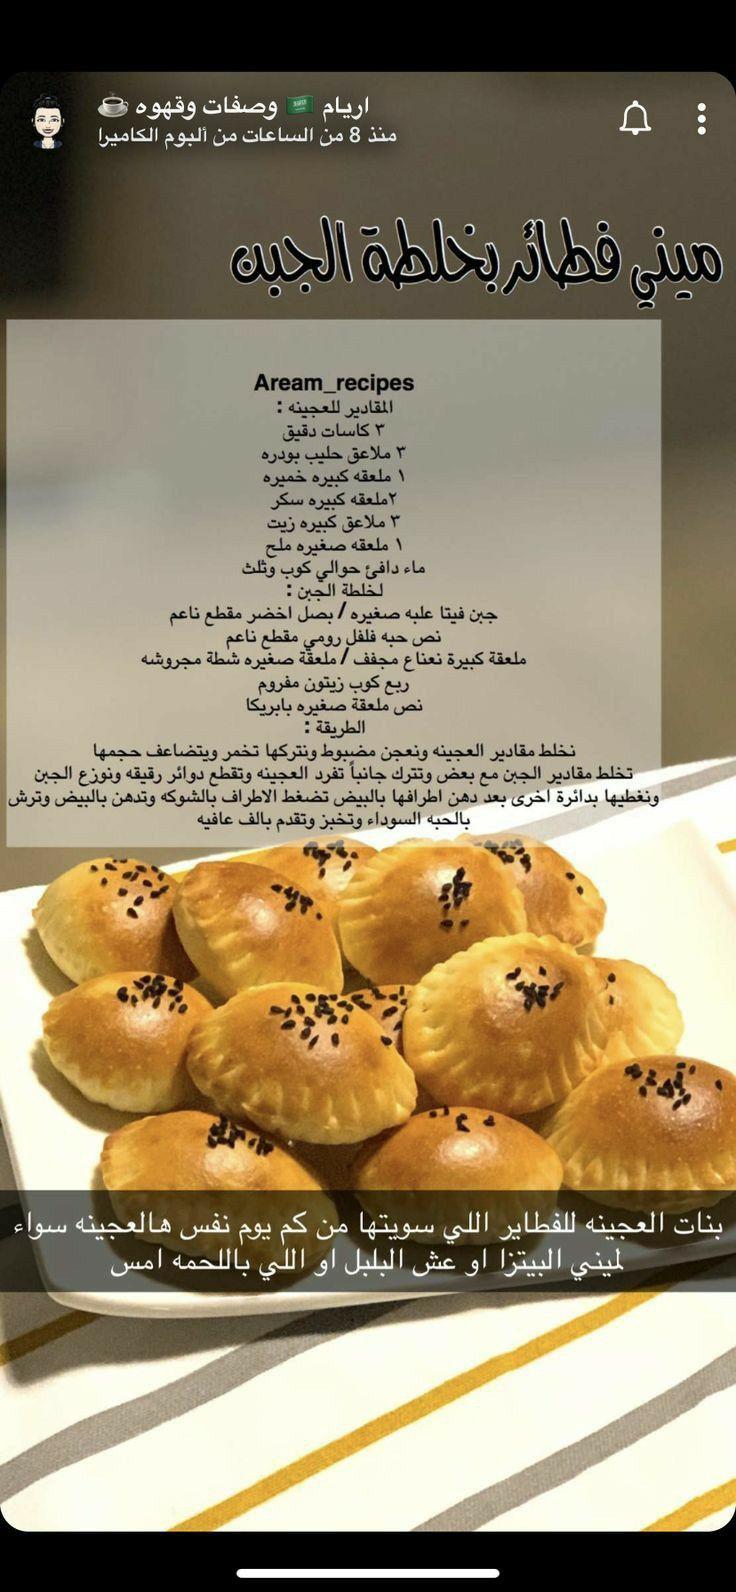 Pin By Tulip On وصفات عربيه وعالميه Arabic Food Recipes Food